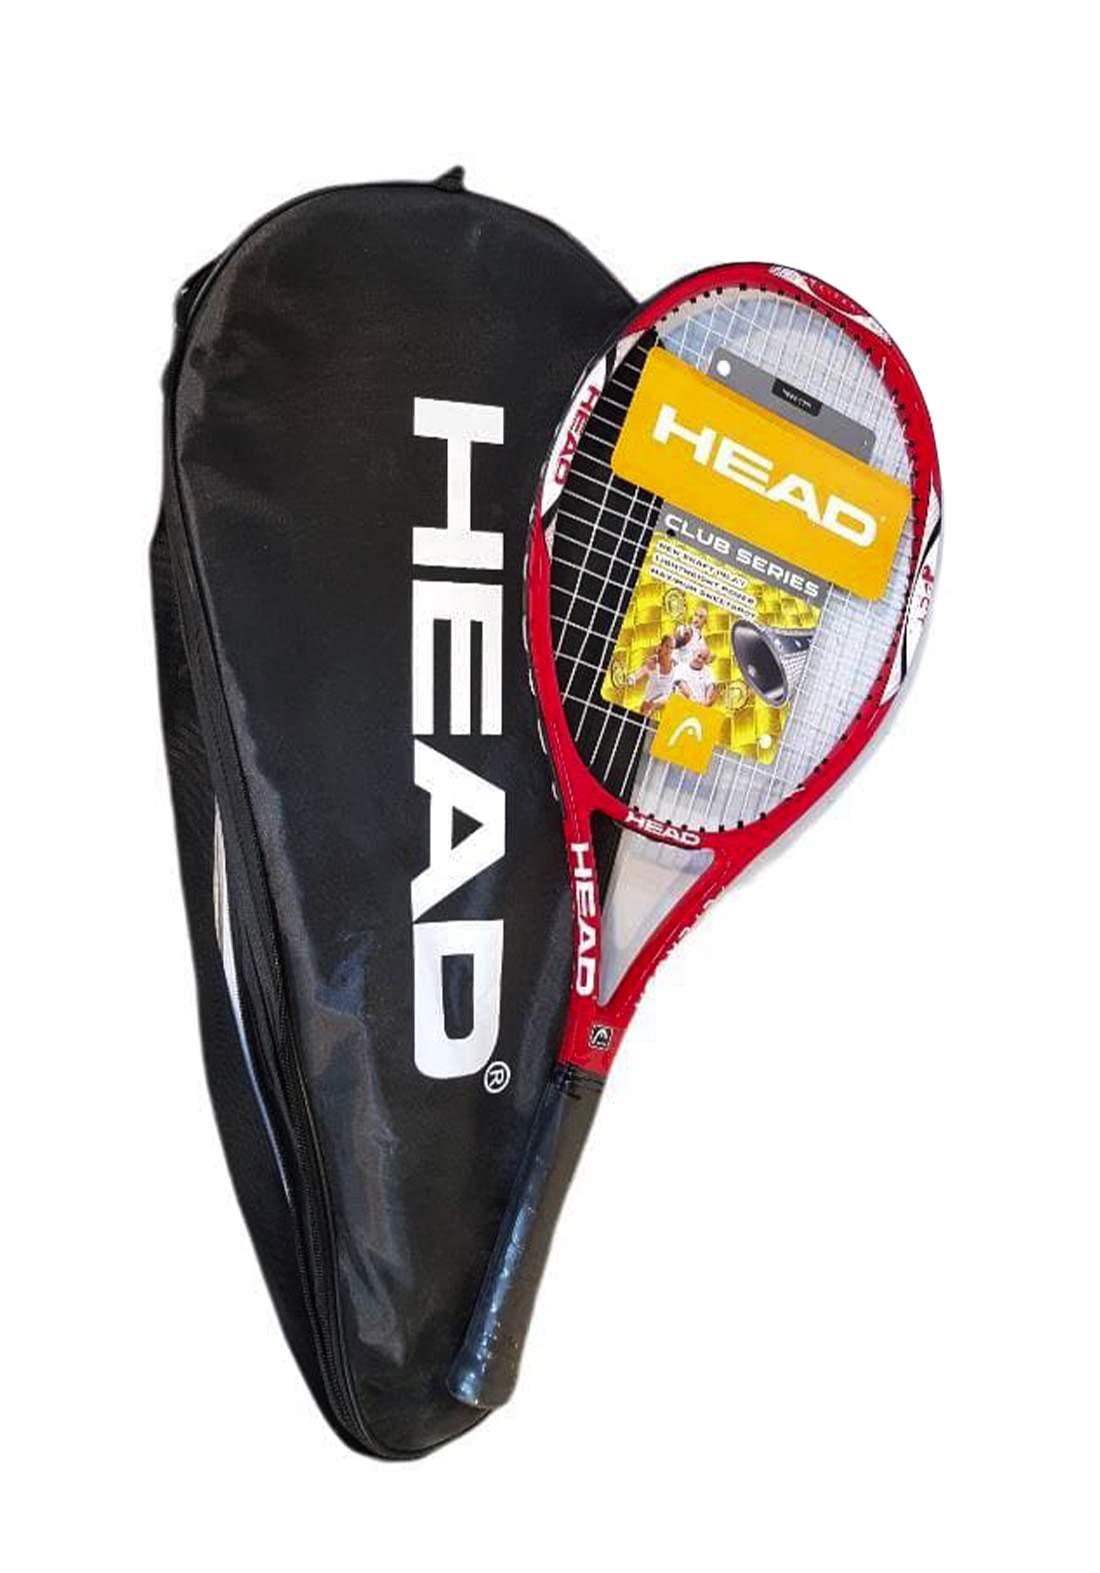 Head Tennis Racket مضرب تنس مفرد